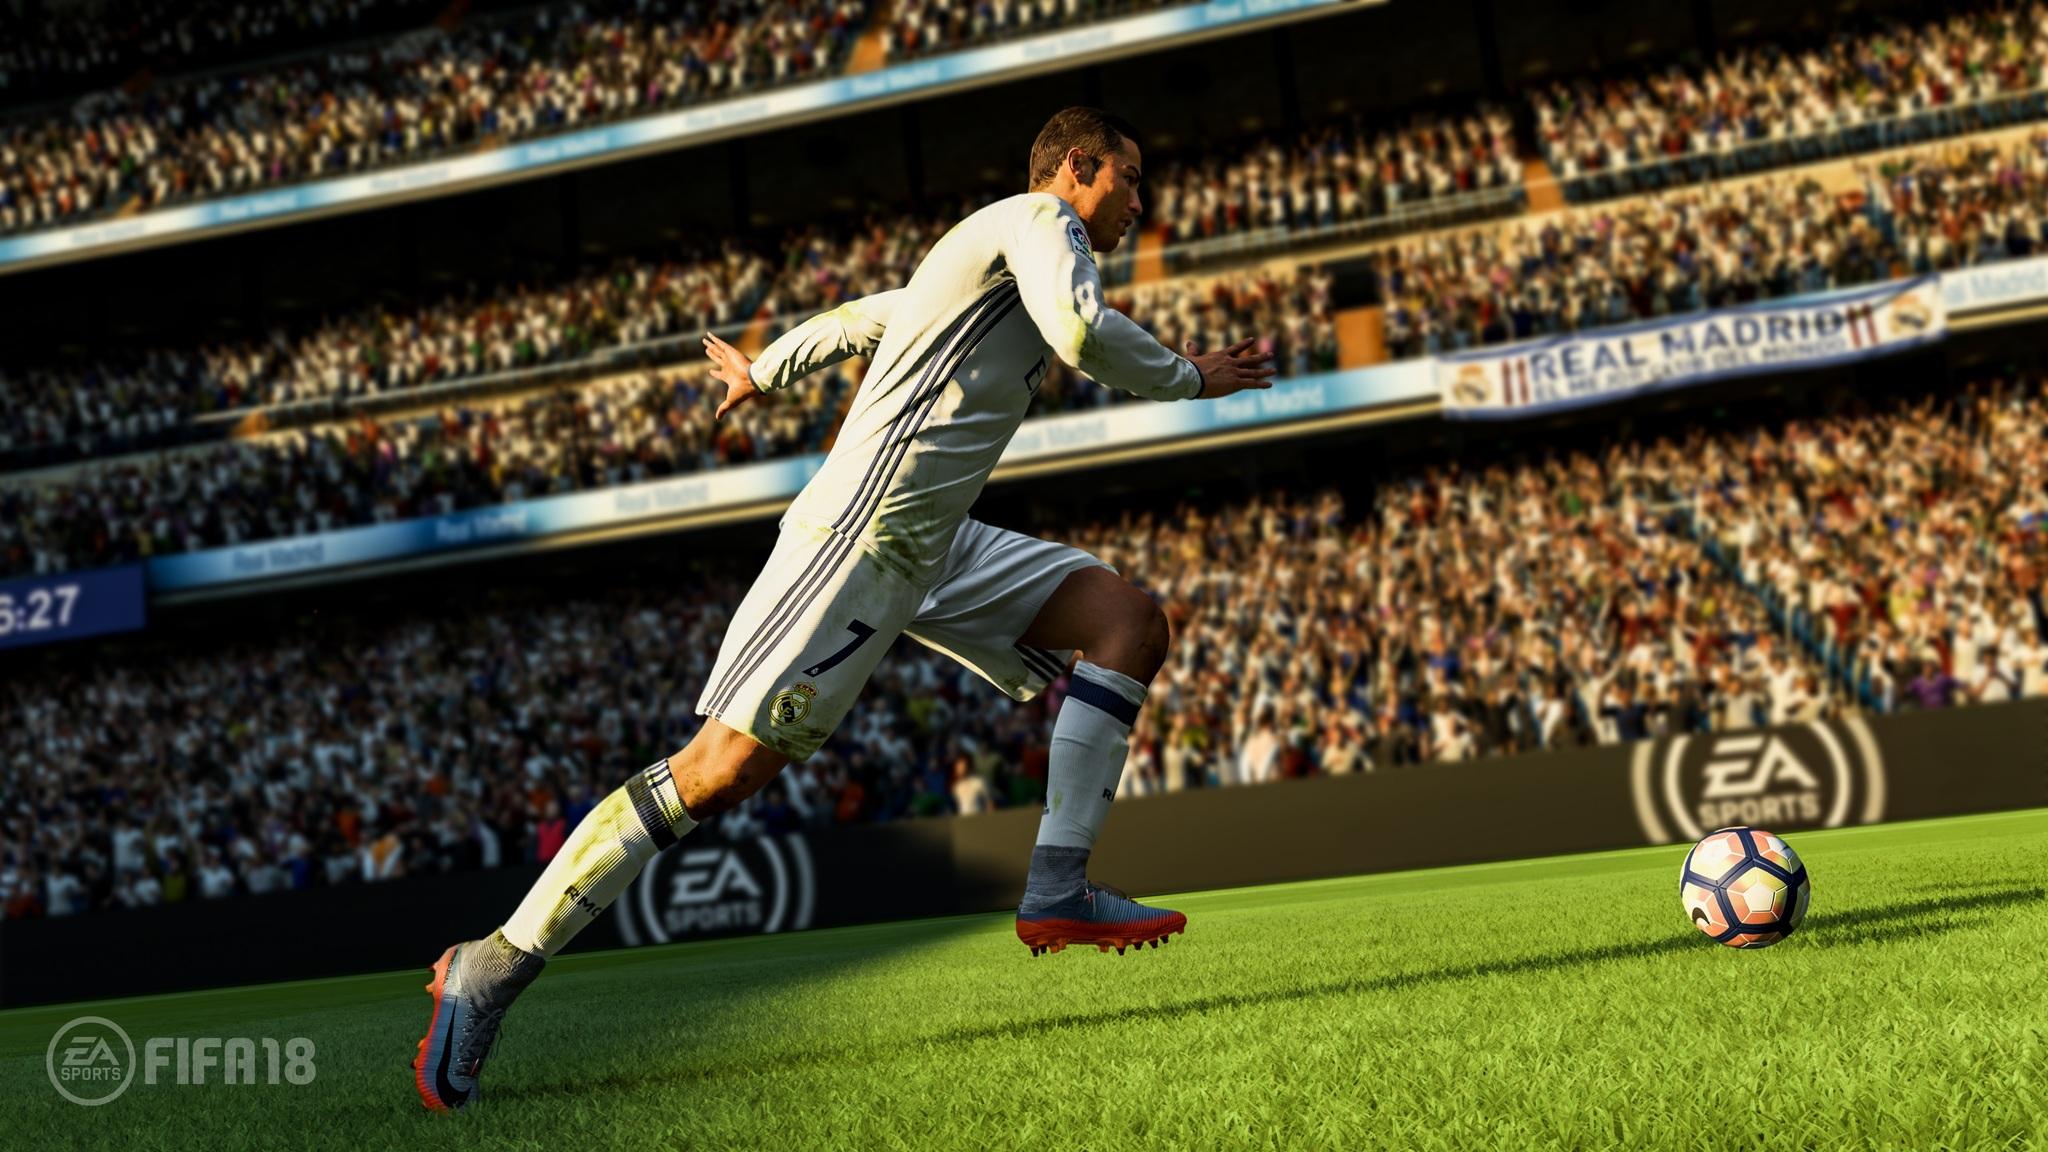 Ronaldo Fifa 18 5k 0e